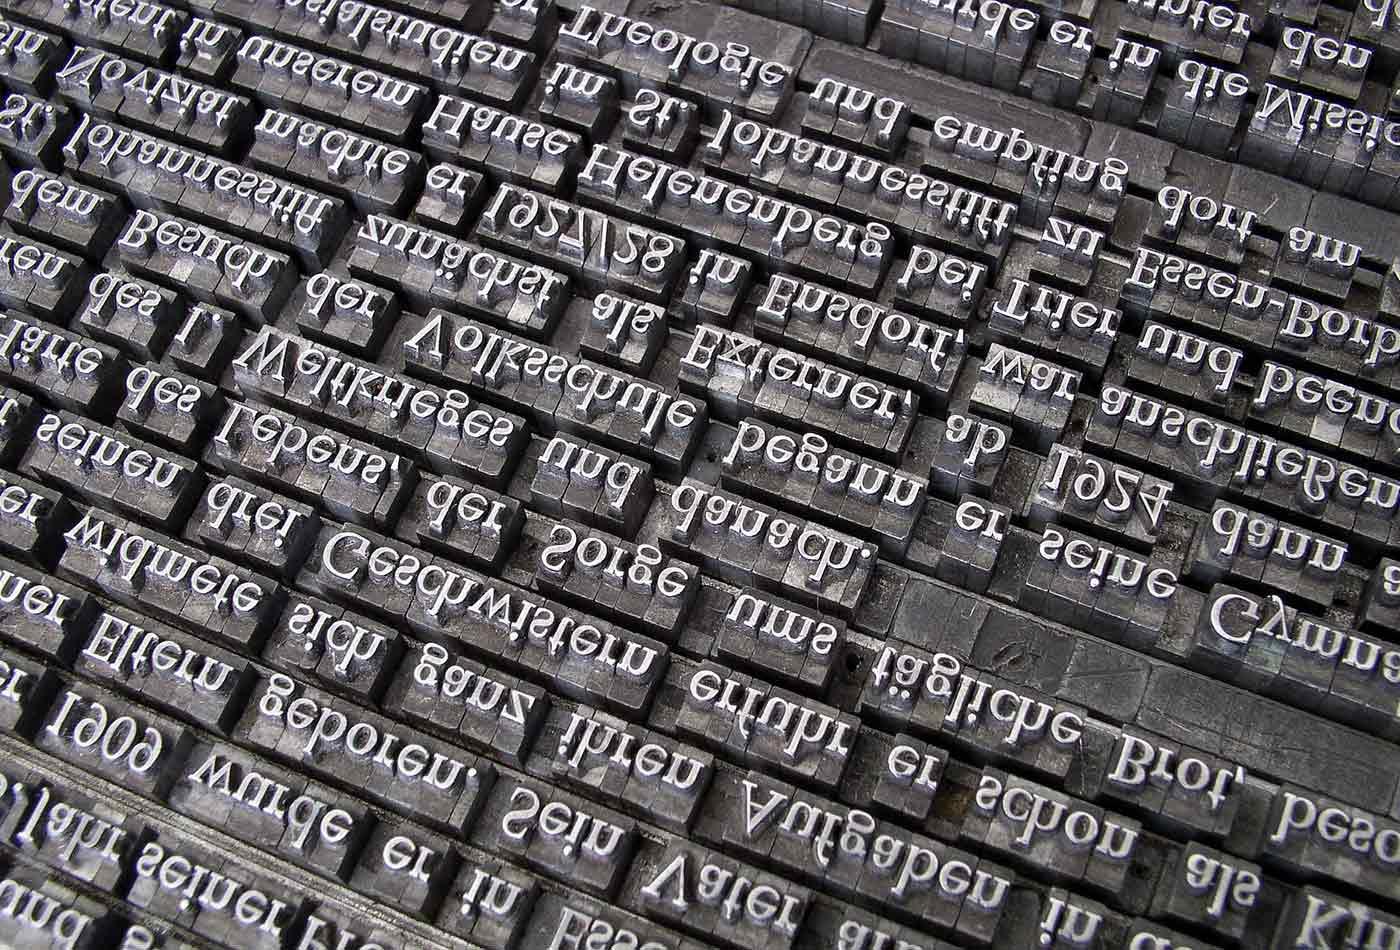 Letterpress set.